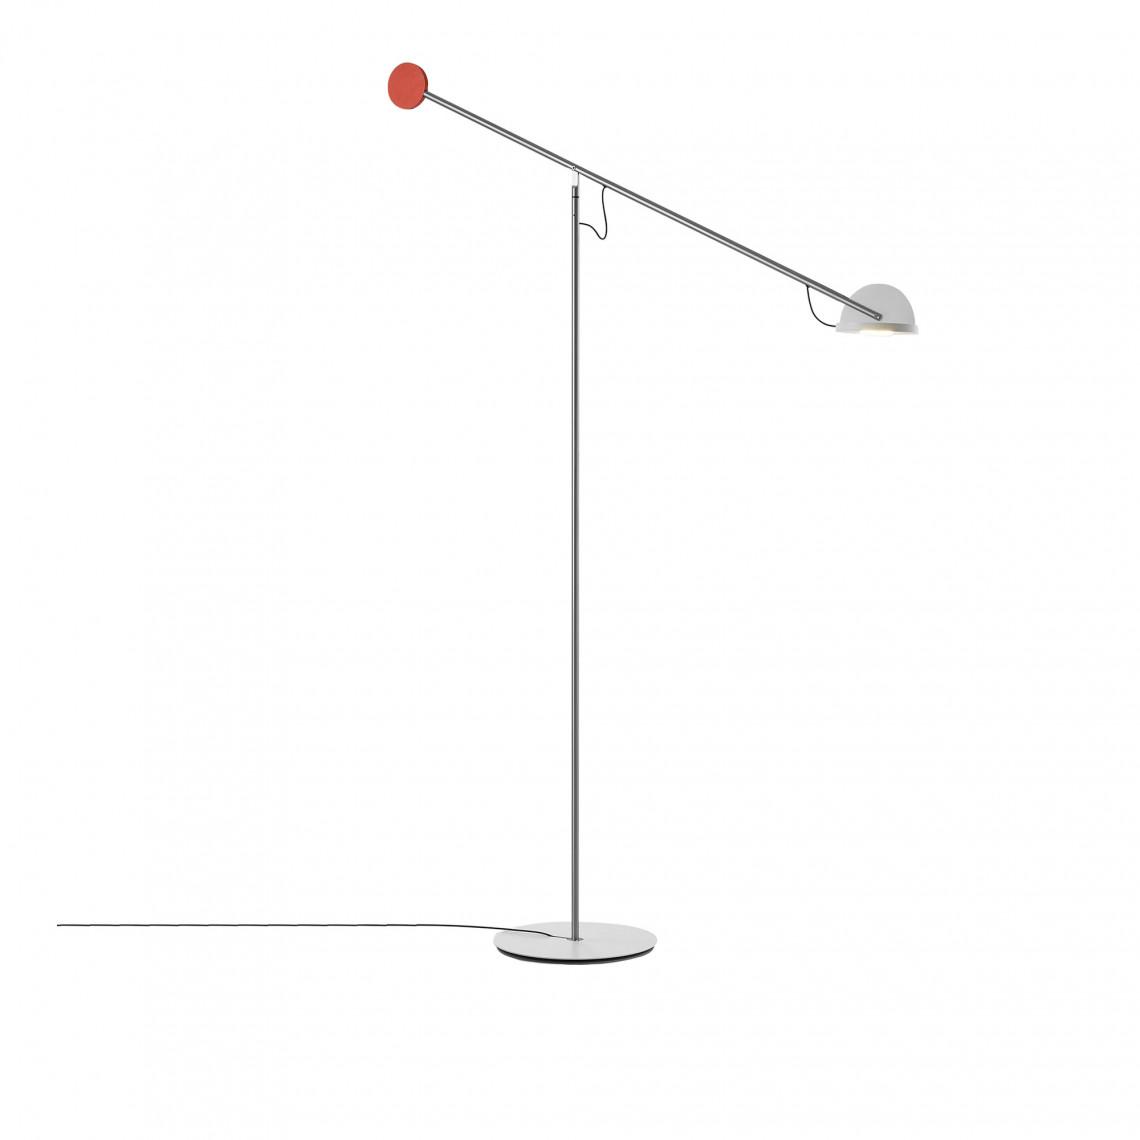 Copernica P - Floor Lamp Red/White